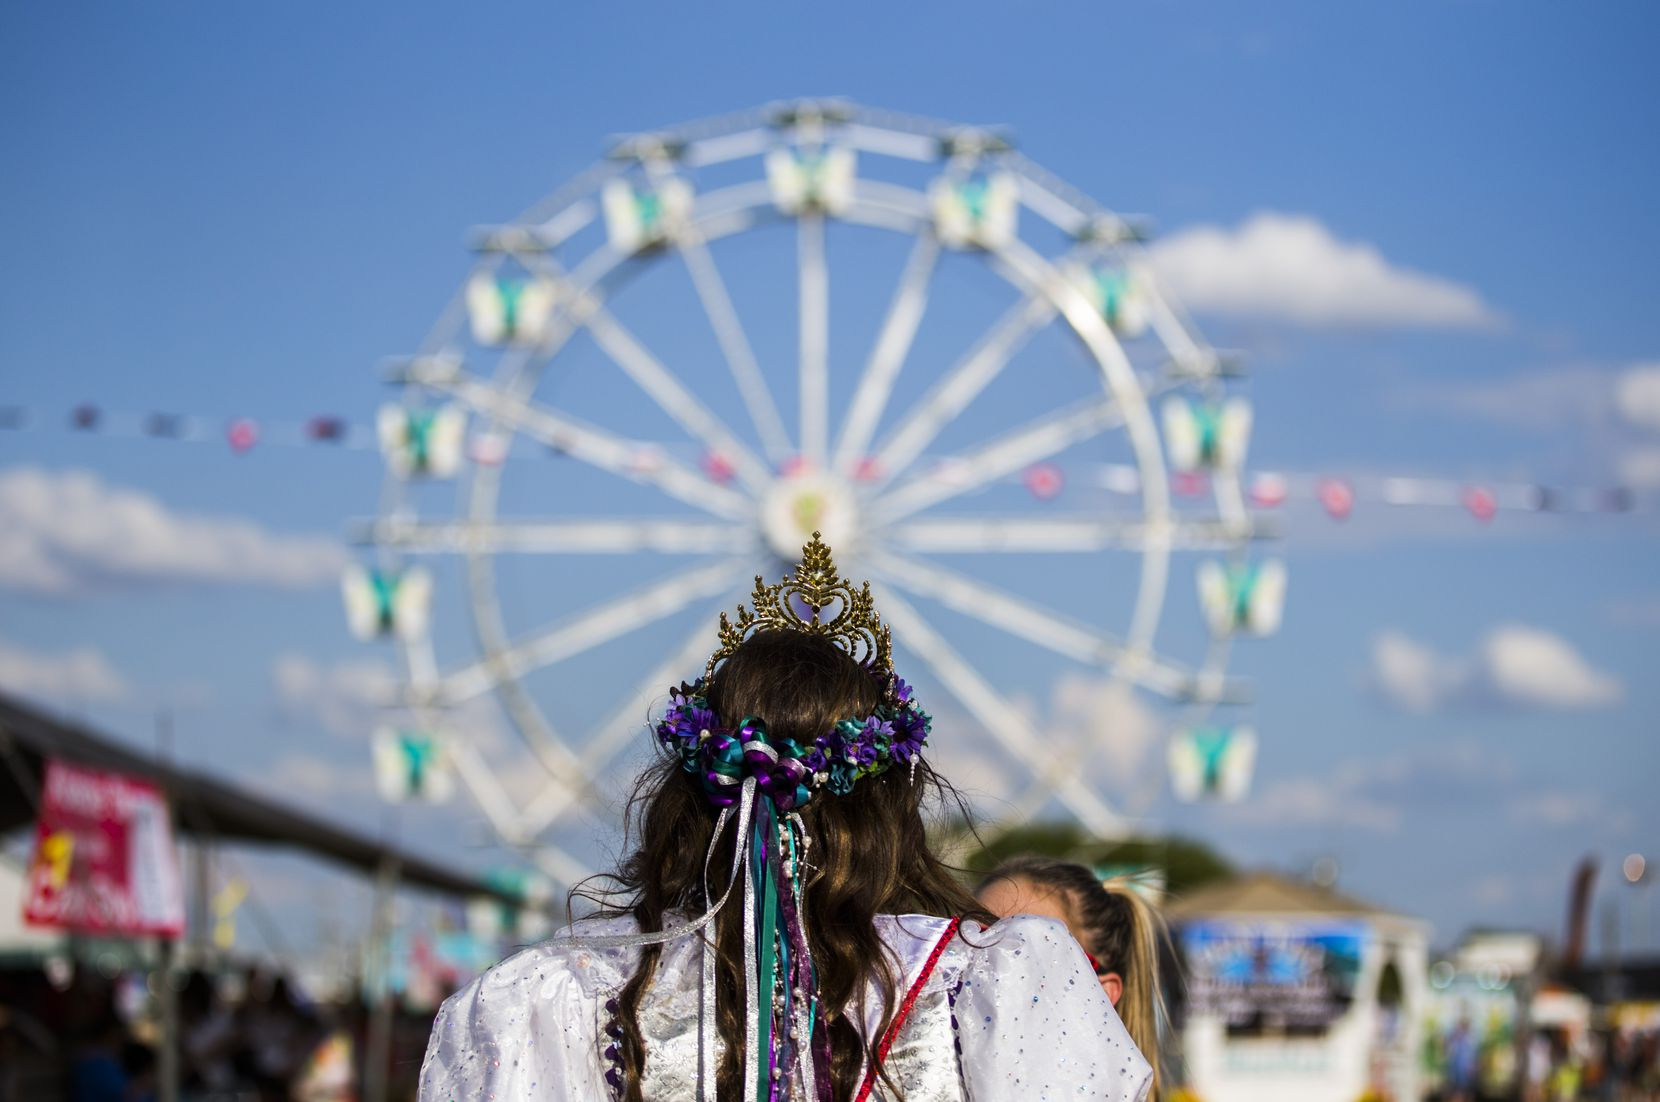 Miss West Fest 2018 Abby Kolar, 18, walks toward a Ferris wheel on the West Fest grounds on September 1, 2018 in West, Texas.